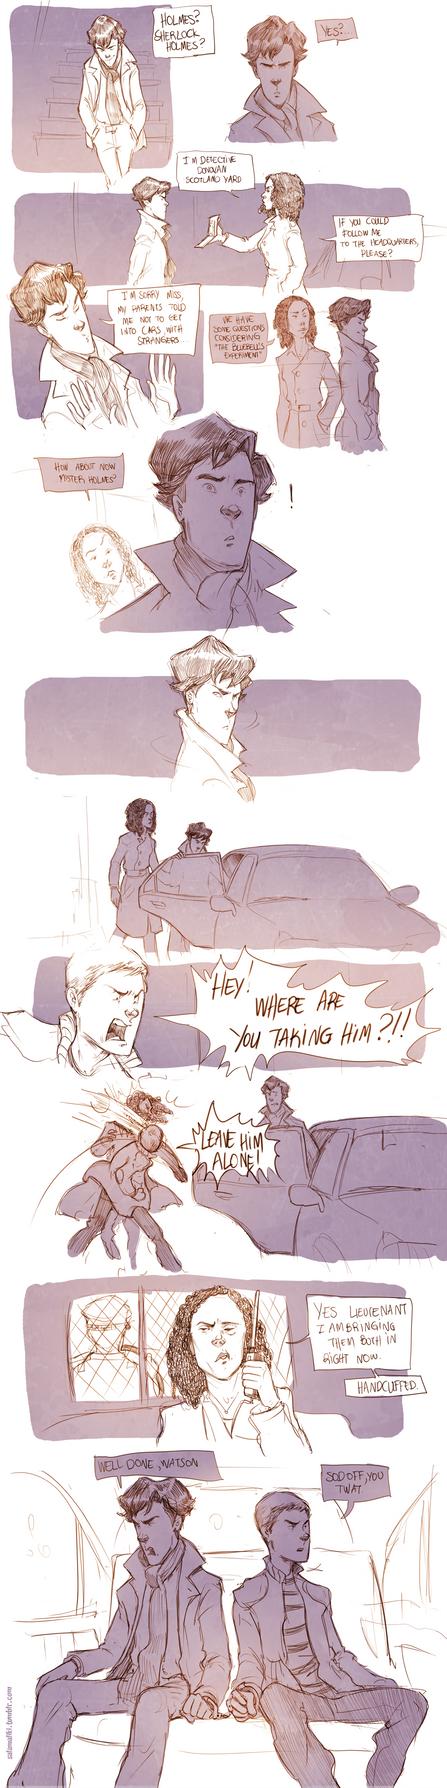 Teen Sherlock The Bluebell's Experiment Pt2 by DrSlug